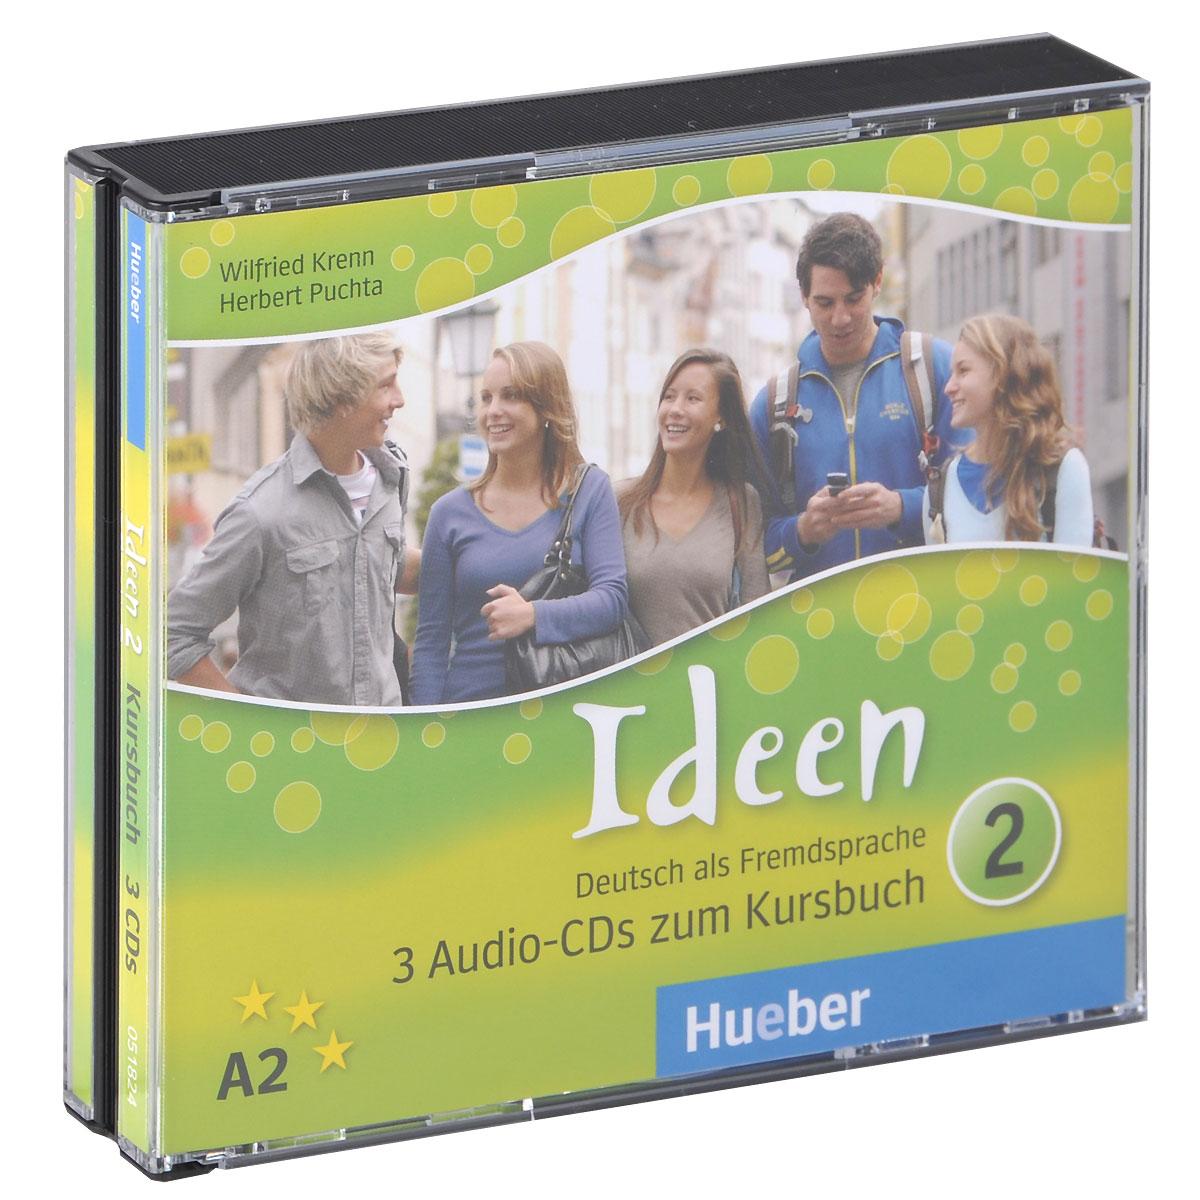 Ideen 2 (аудиокурс на 3 CD)